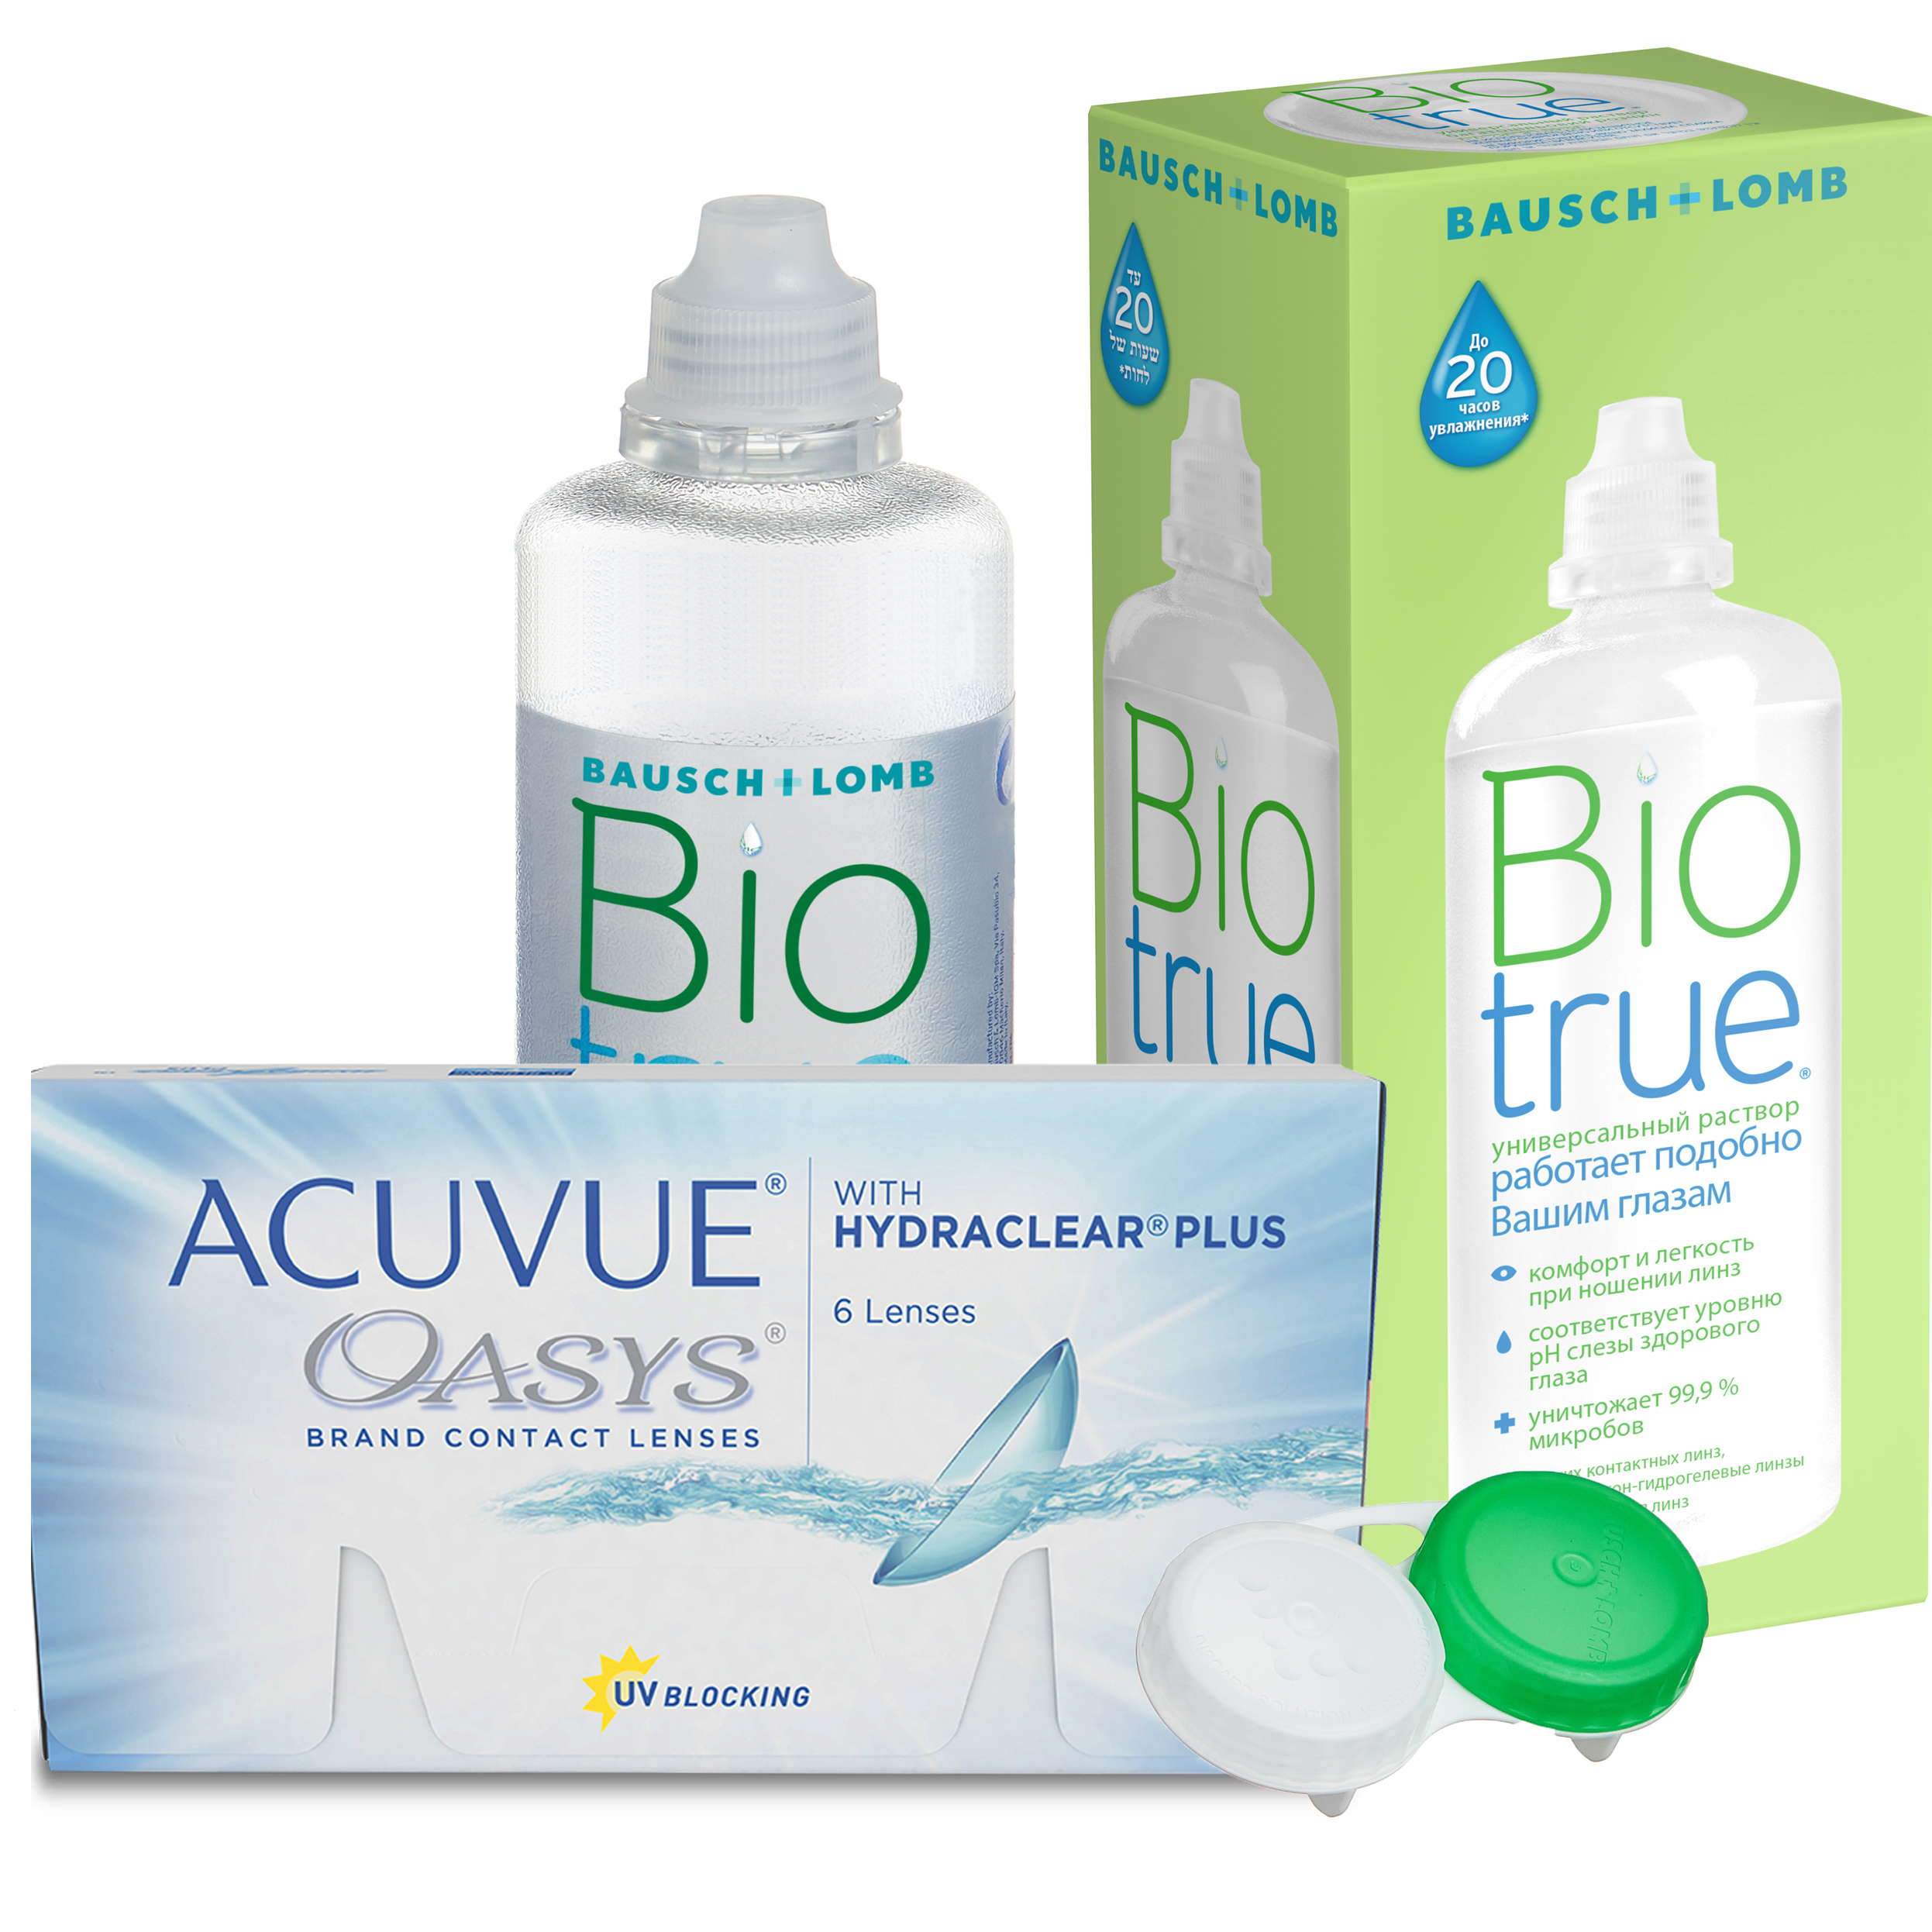 Купить Oasys with Hydraclear Plus 6 линз + Biotrue, Контактные линзы Acuvue Oasys with Hydraclear Plus 6 линз R 8.8 +6, 50 + Biotrue 300 мл